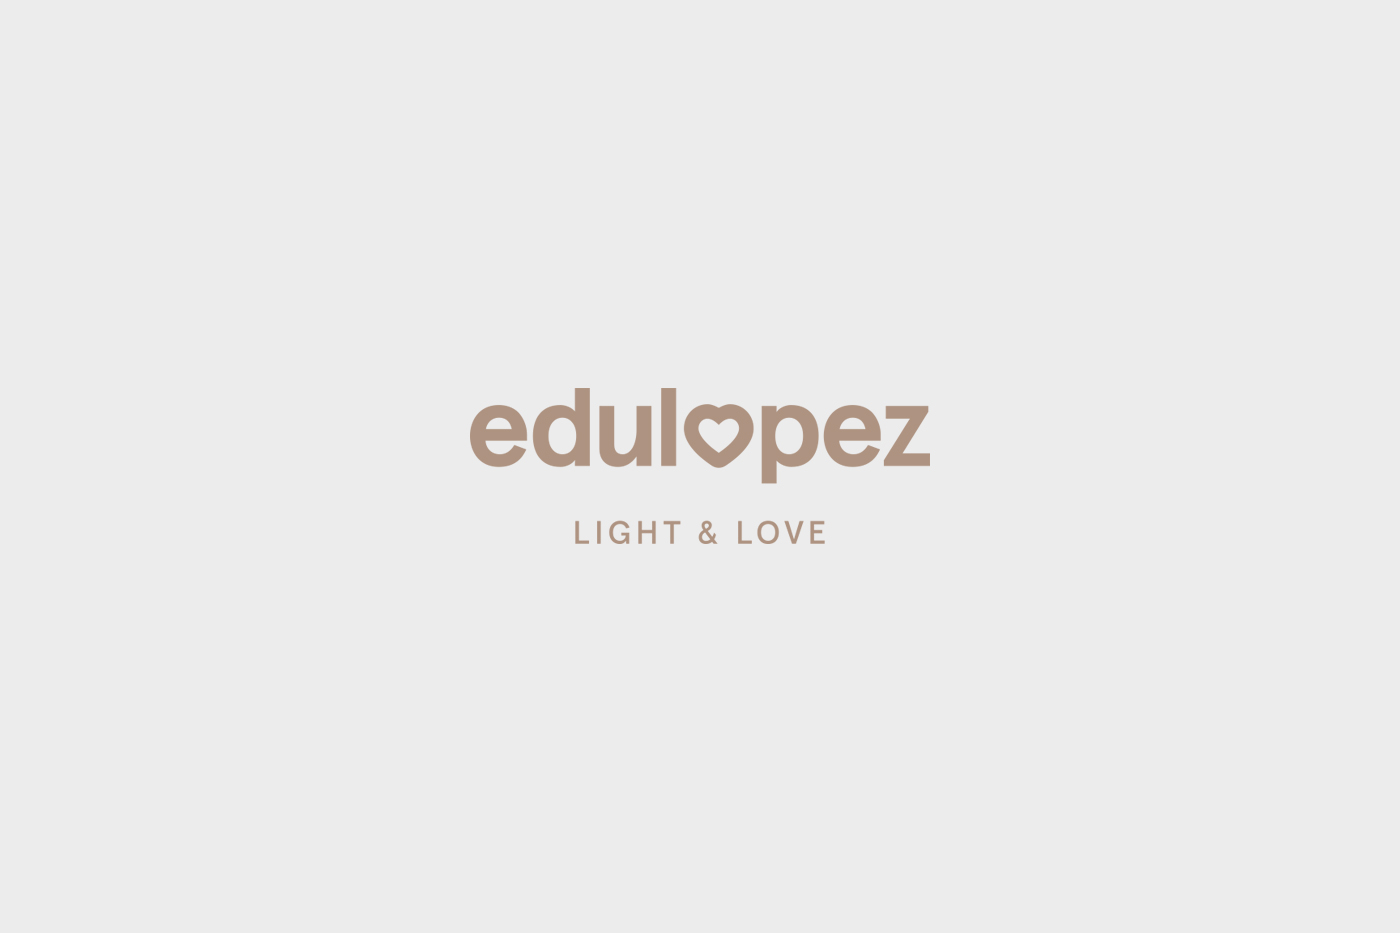 logotipo_Edulopez.jpg